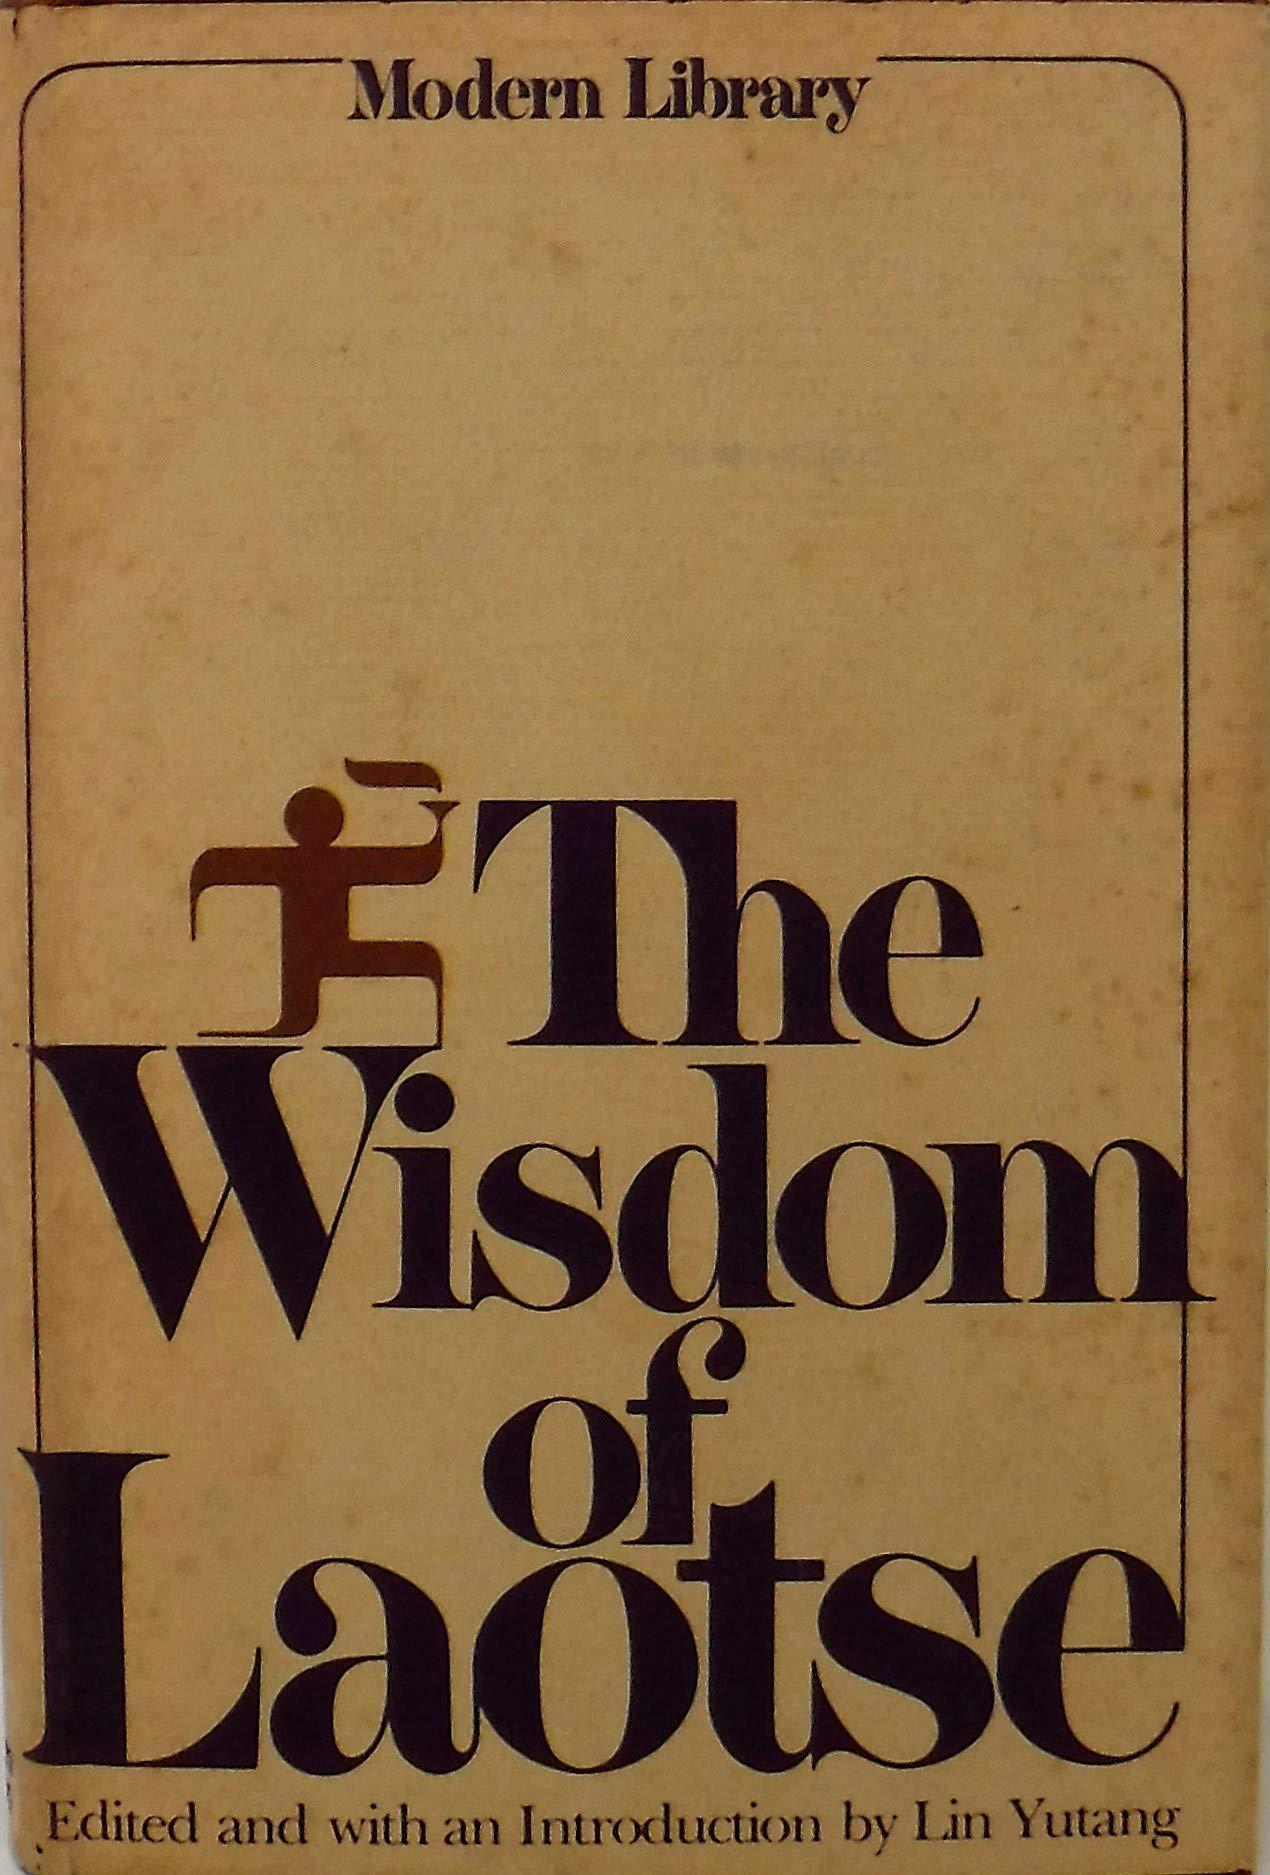 The Wisdom of Lao Tse , edited by Lin Yutang